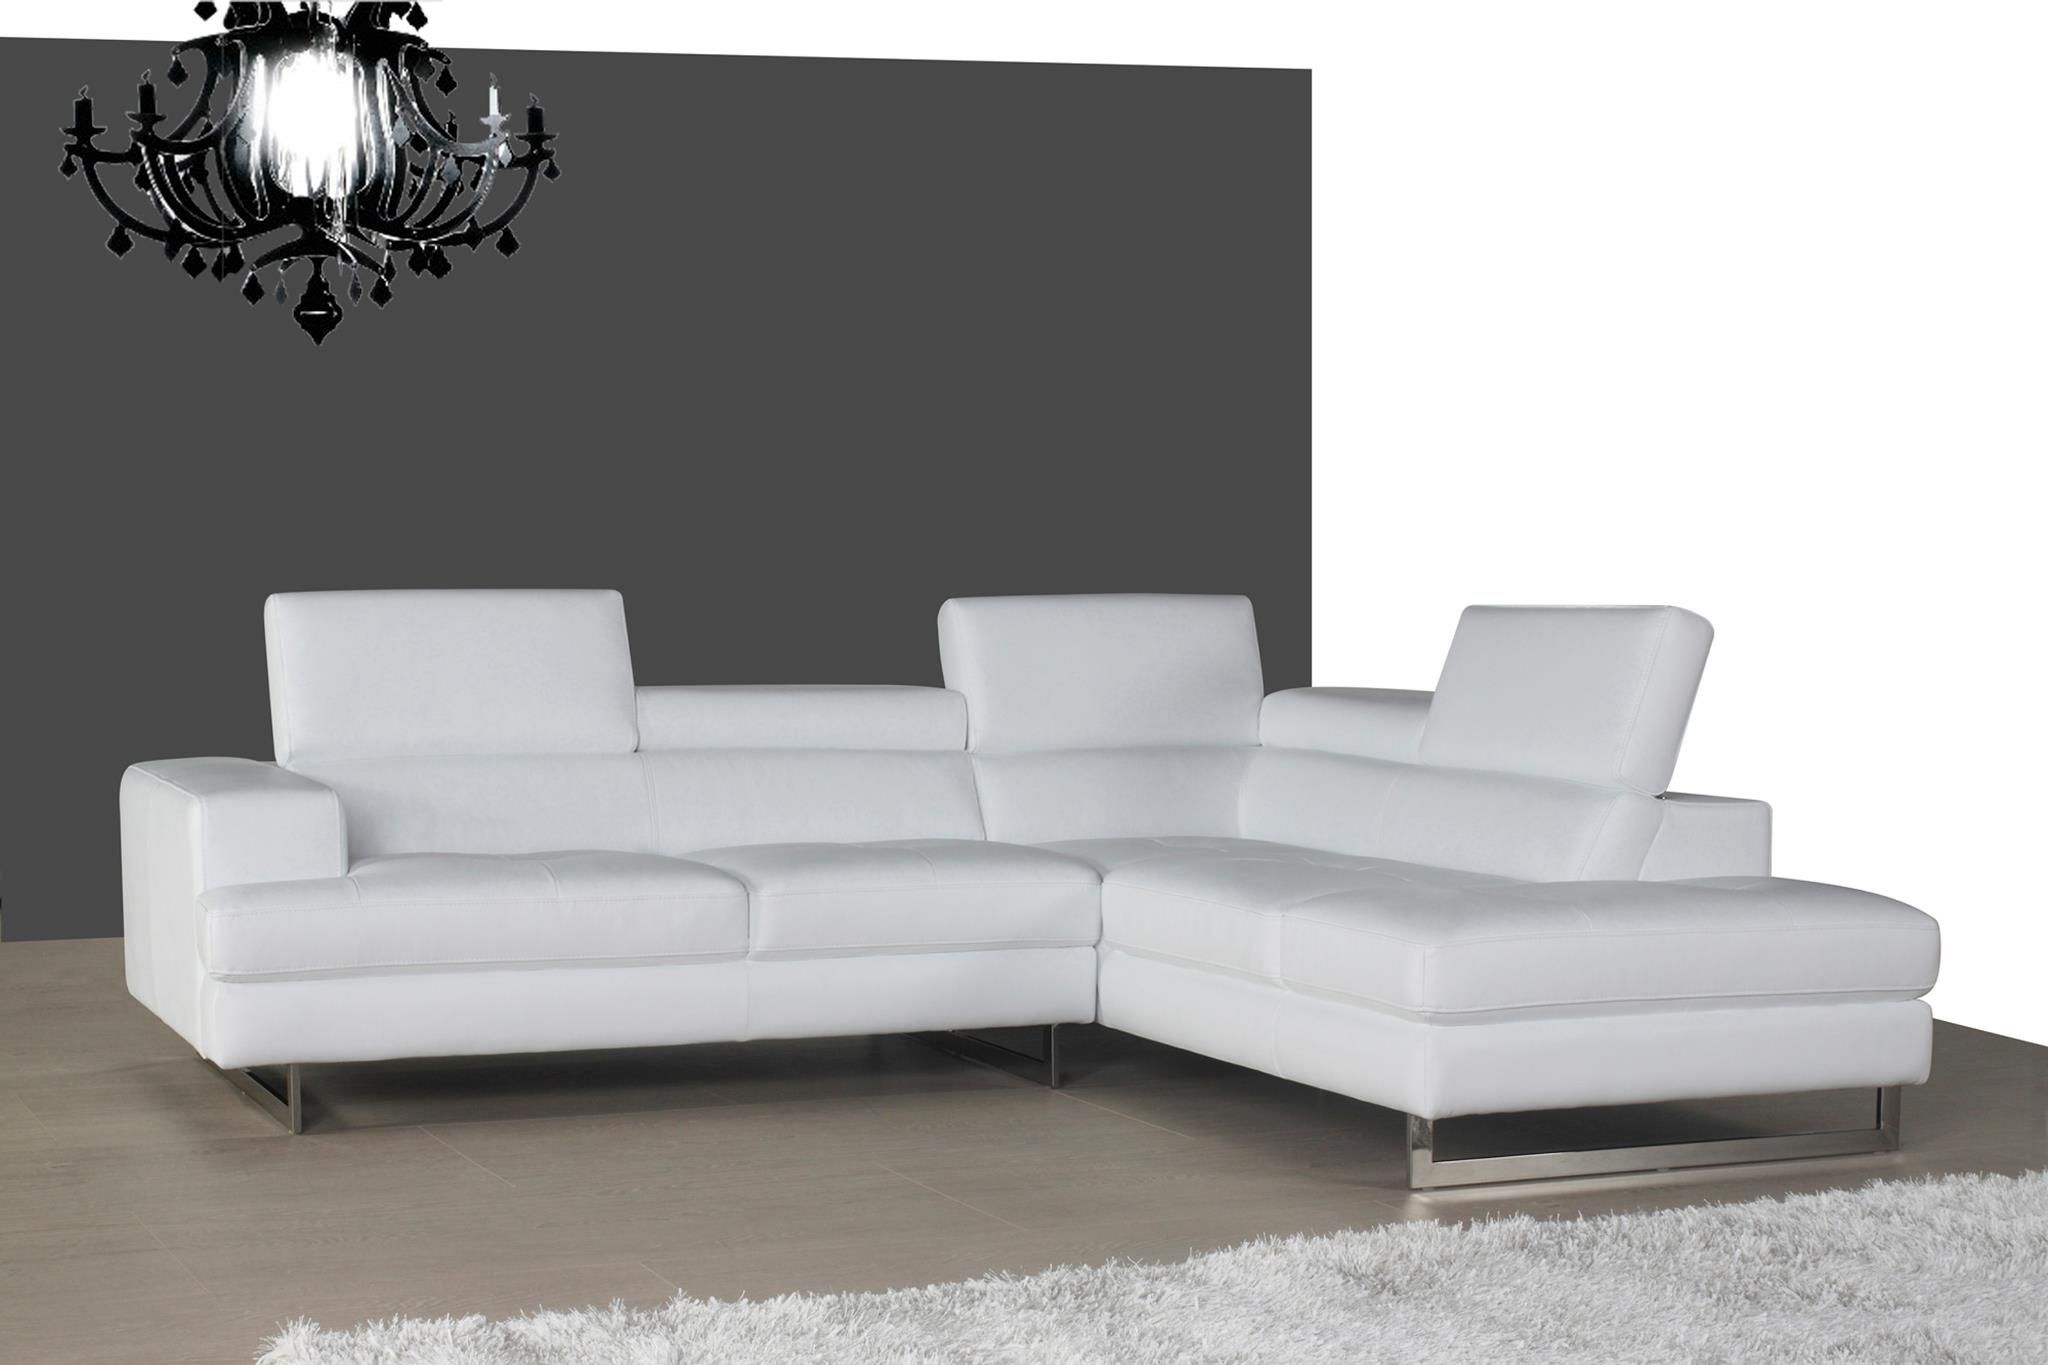 Modern Sofa Sets Toronto Chesterfield Leather Sofas Juego De Sala Muebleria Berrios 1 995 Mi Dulce Hogar